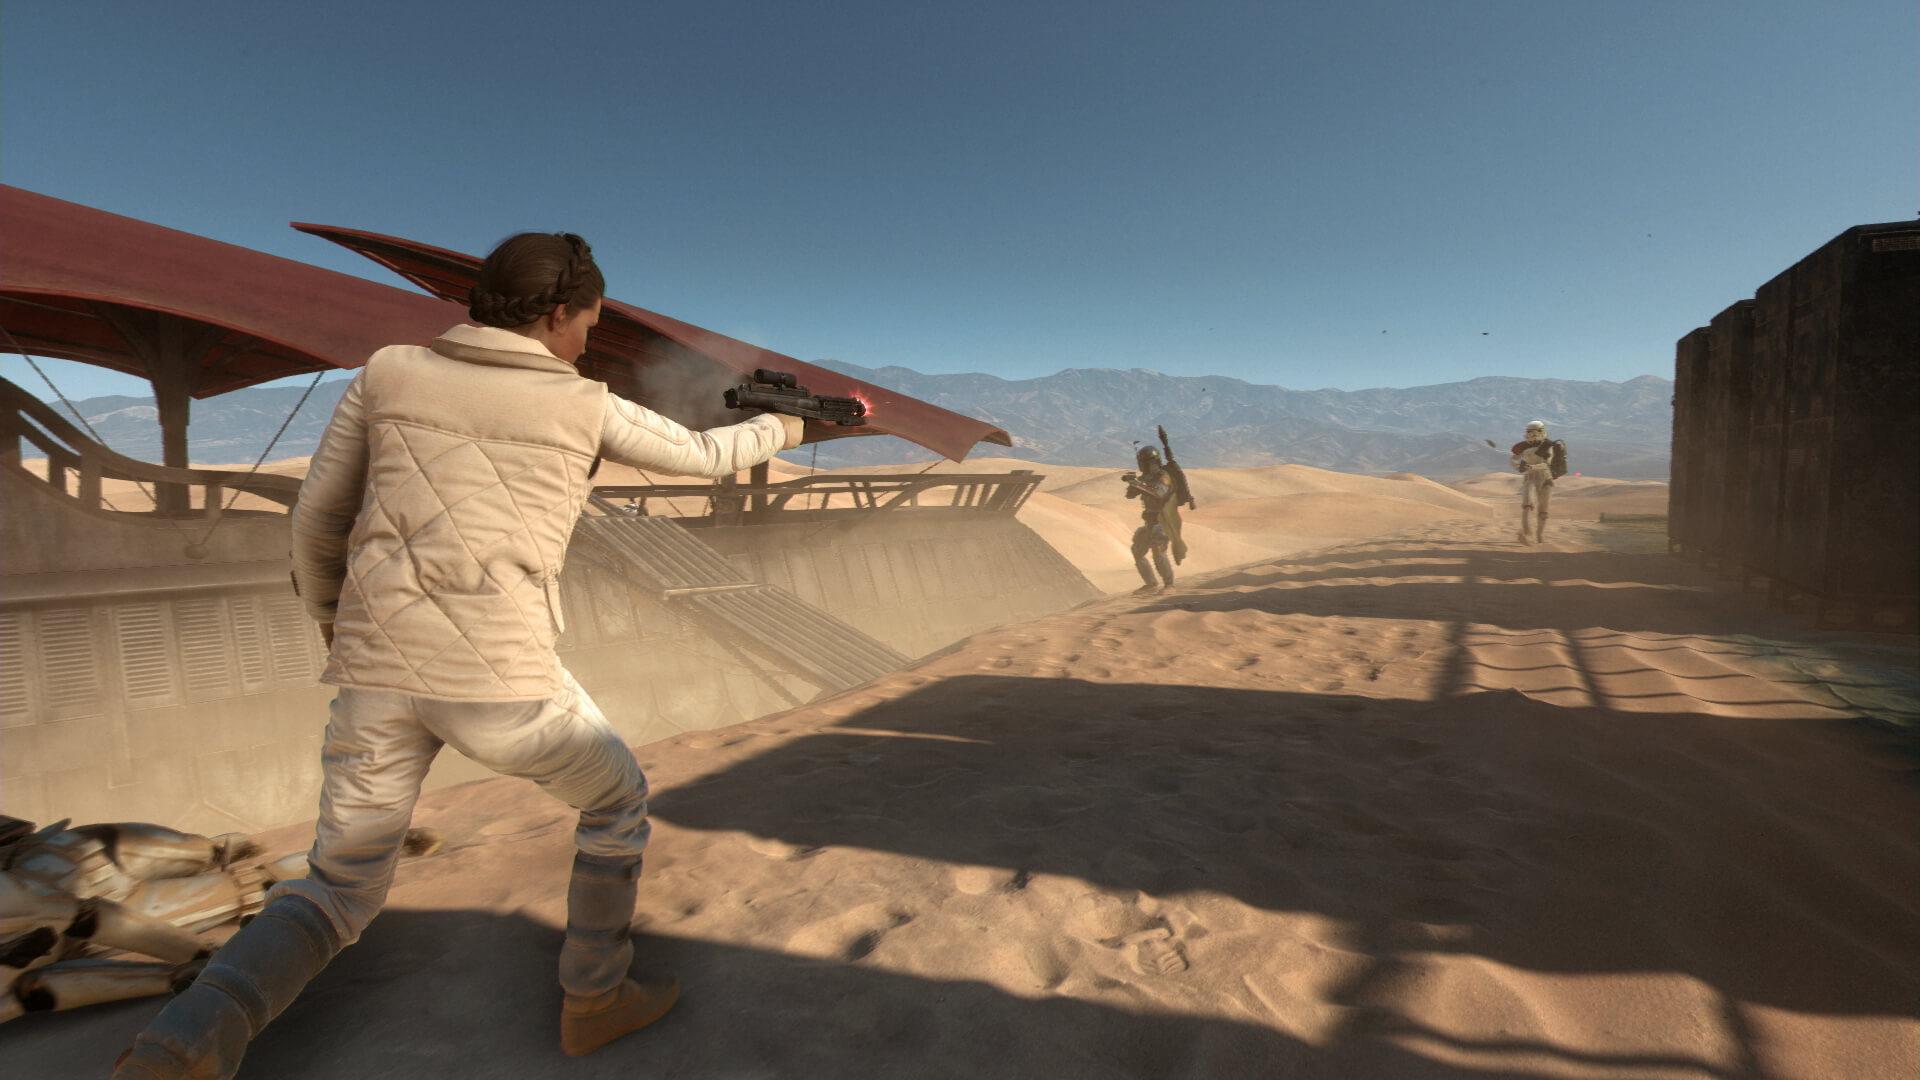 Star Wars Battlefront, Princess Leia vs. Boba Fett Gameplay